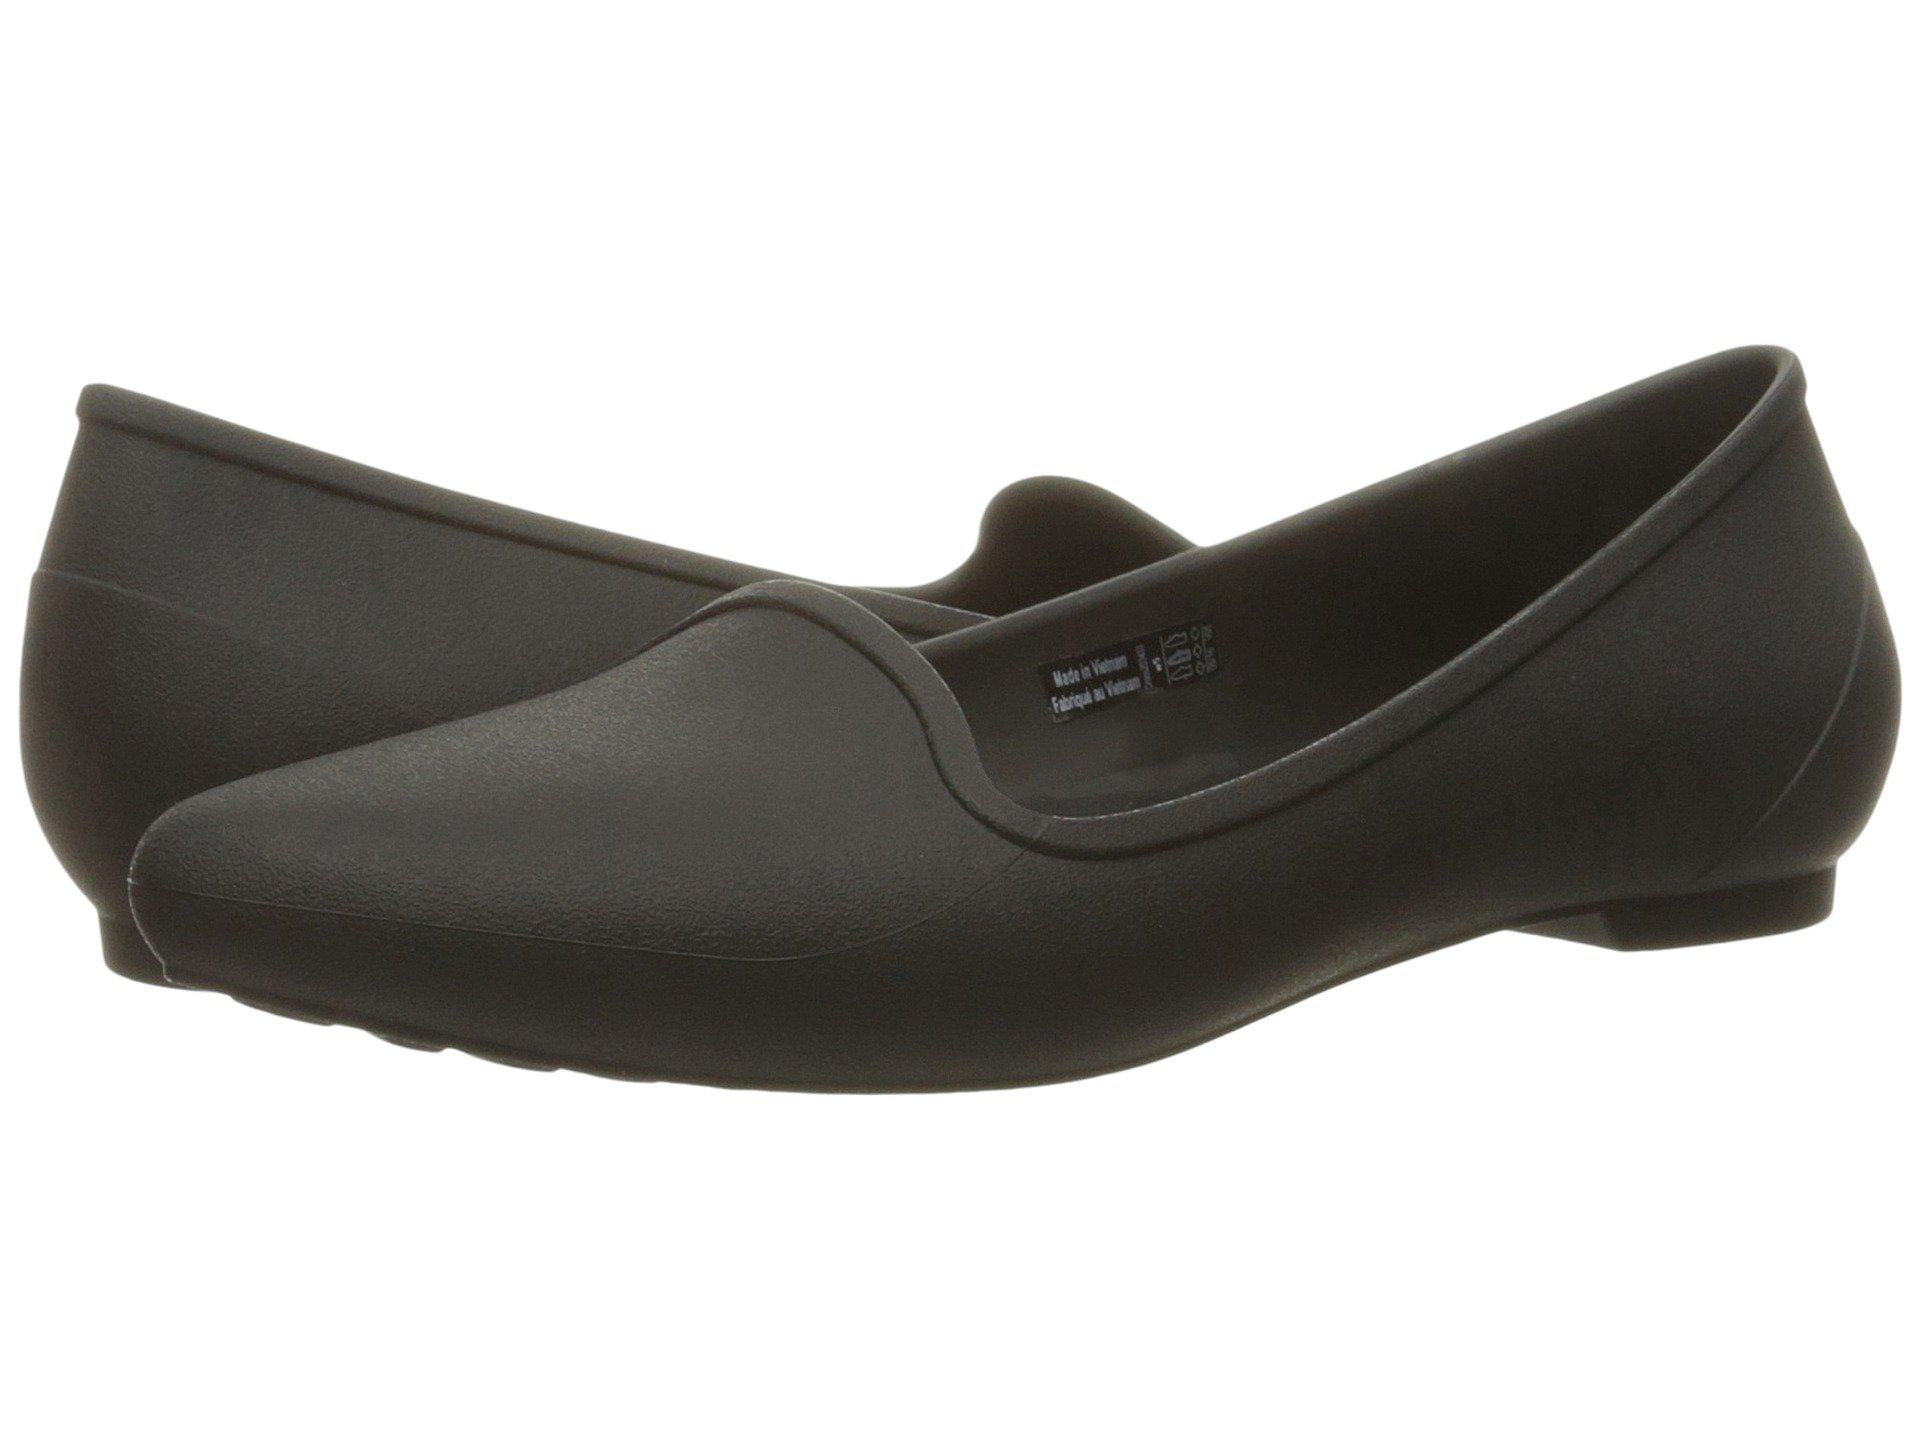 ccbc0e9ae73871 Lyst - Crocs™ Eve Flat in Black